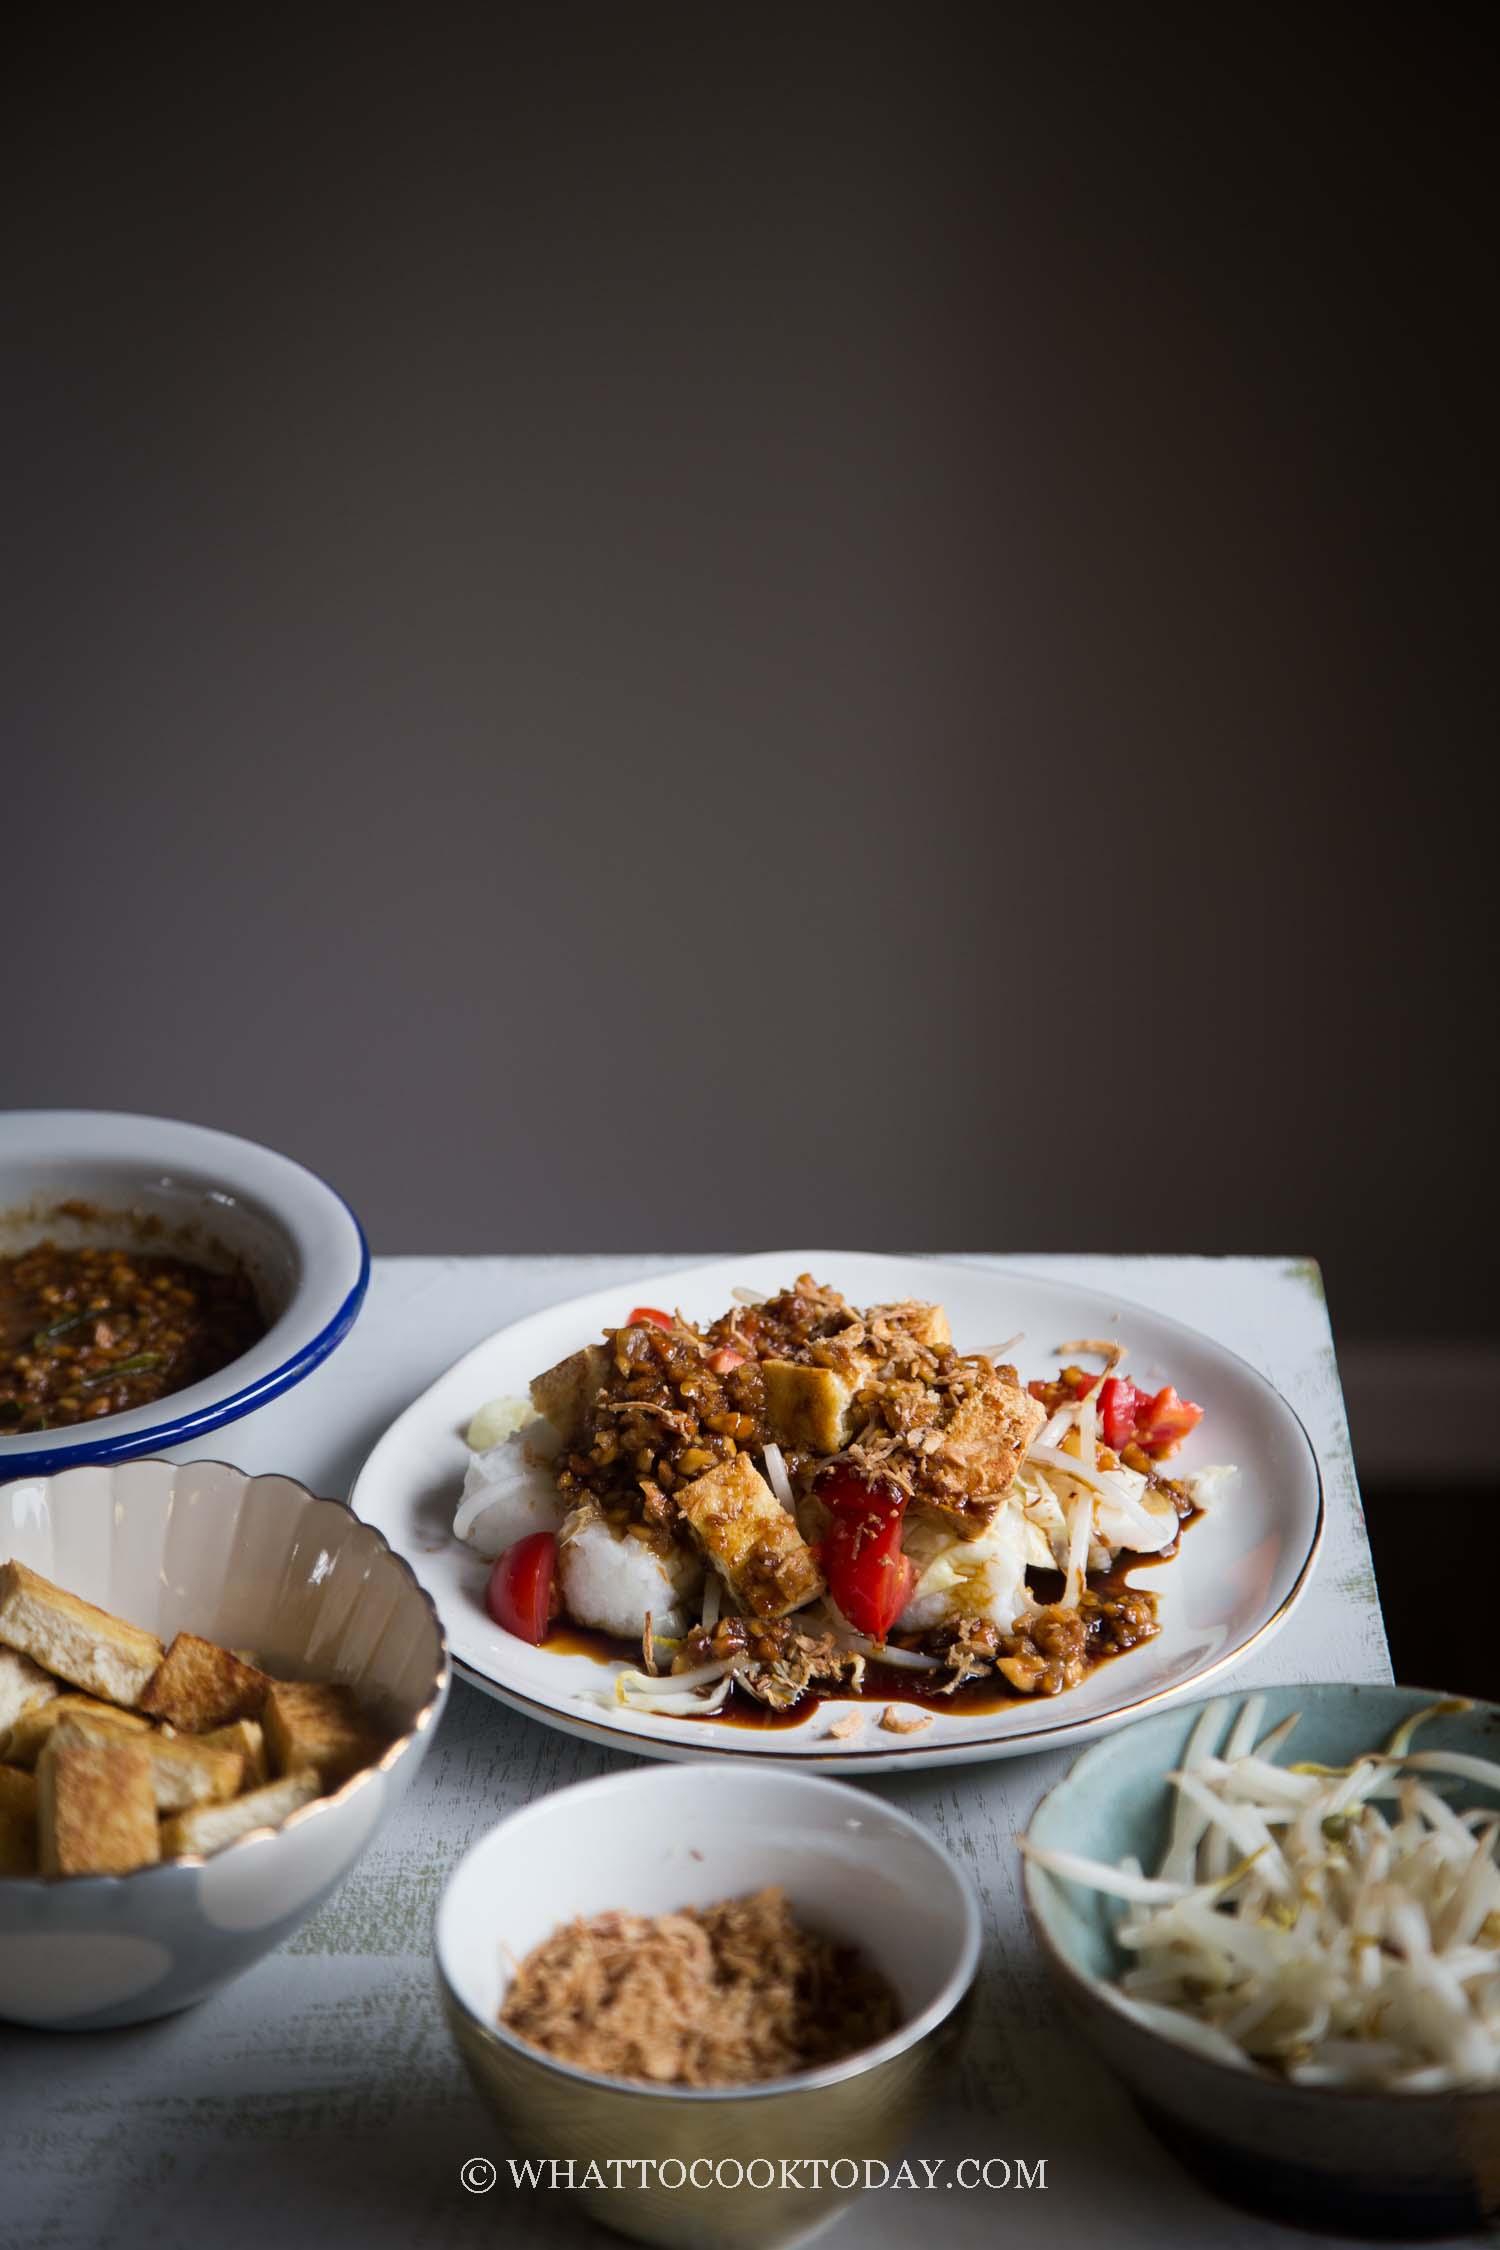 Tahu Goreng Kecap (Tofu with sweet soy sauce dressing)